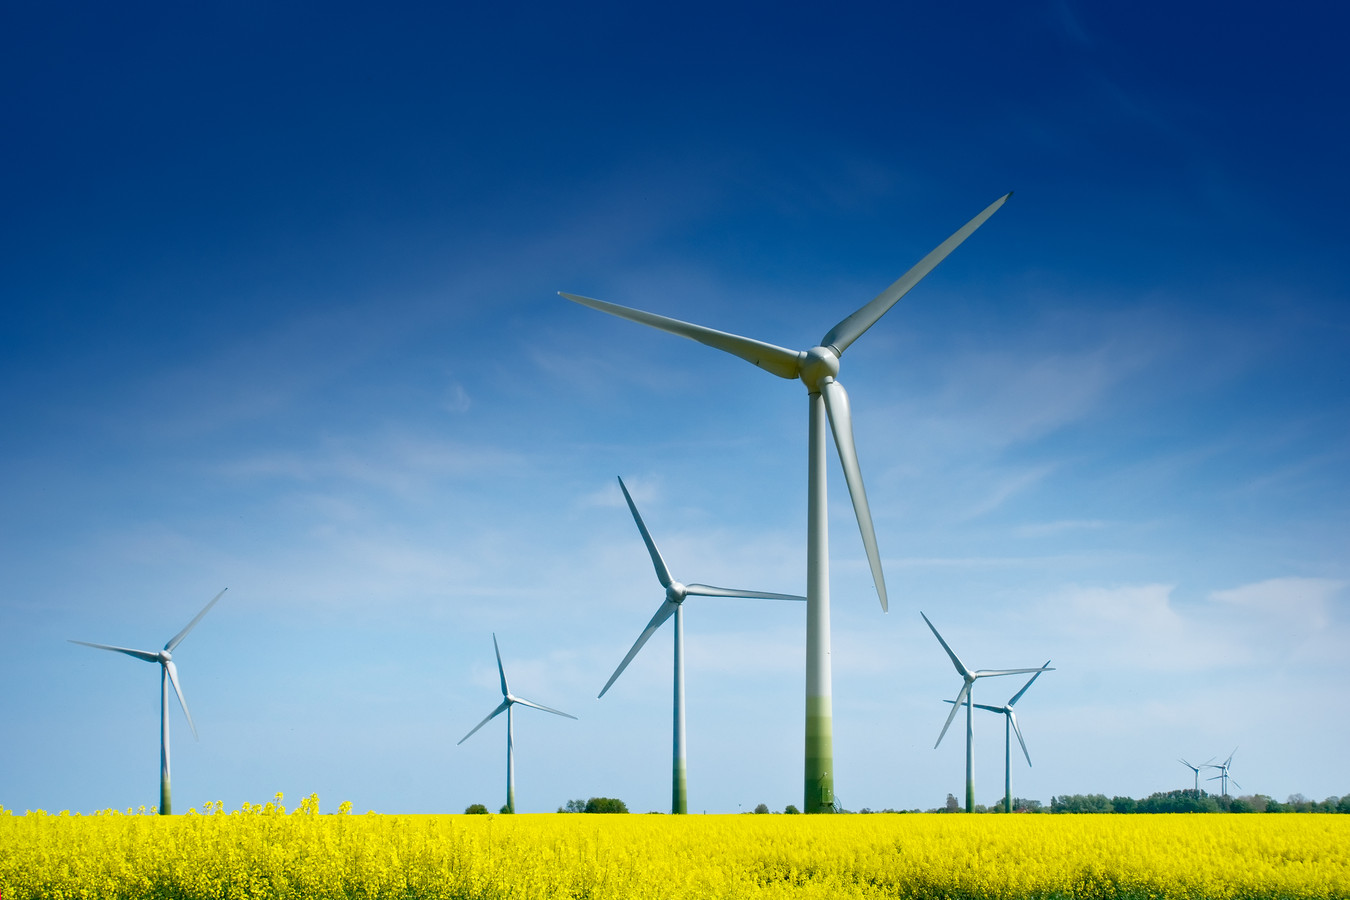 Waar en wanneer komen er windturbines in en rond Baarle-Nassau?